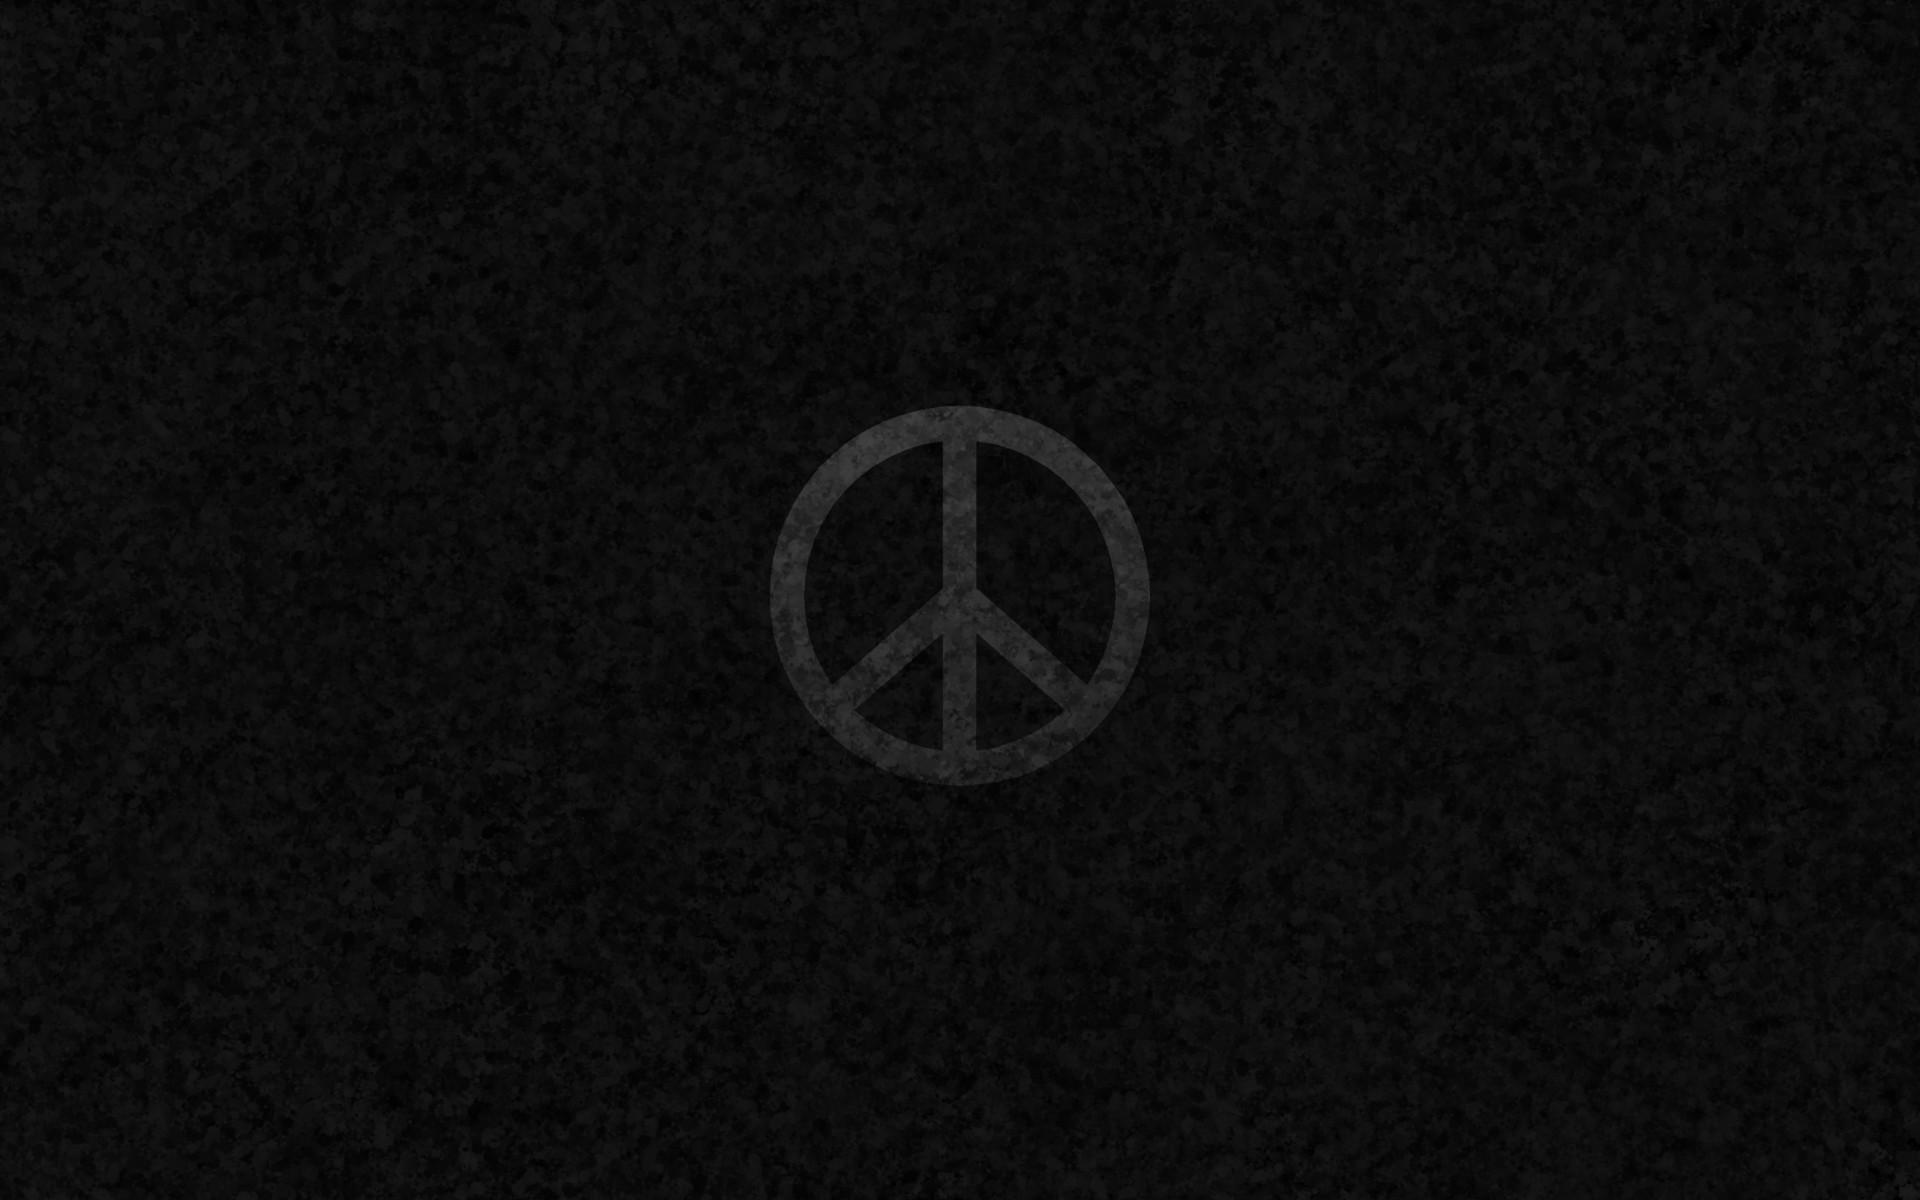 Samurai Wallpaper Iphone 6 Peace Sign Desktop Wallpaper 58 Images